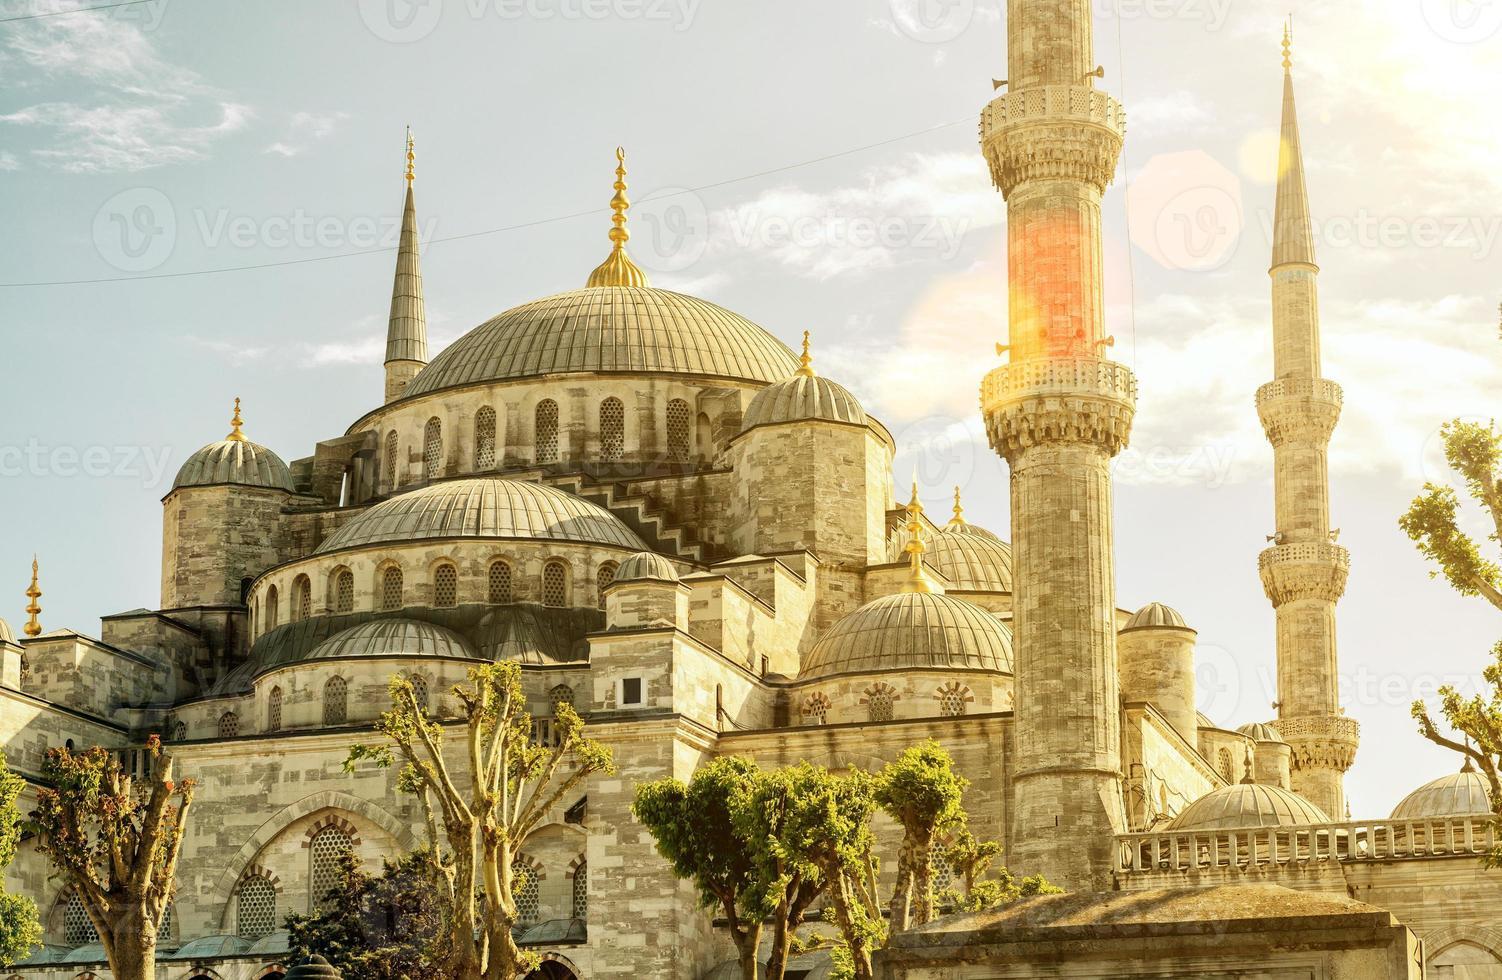 vista da mesquita azul (sultanahmet camii) em Istambul foto